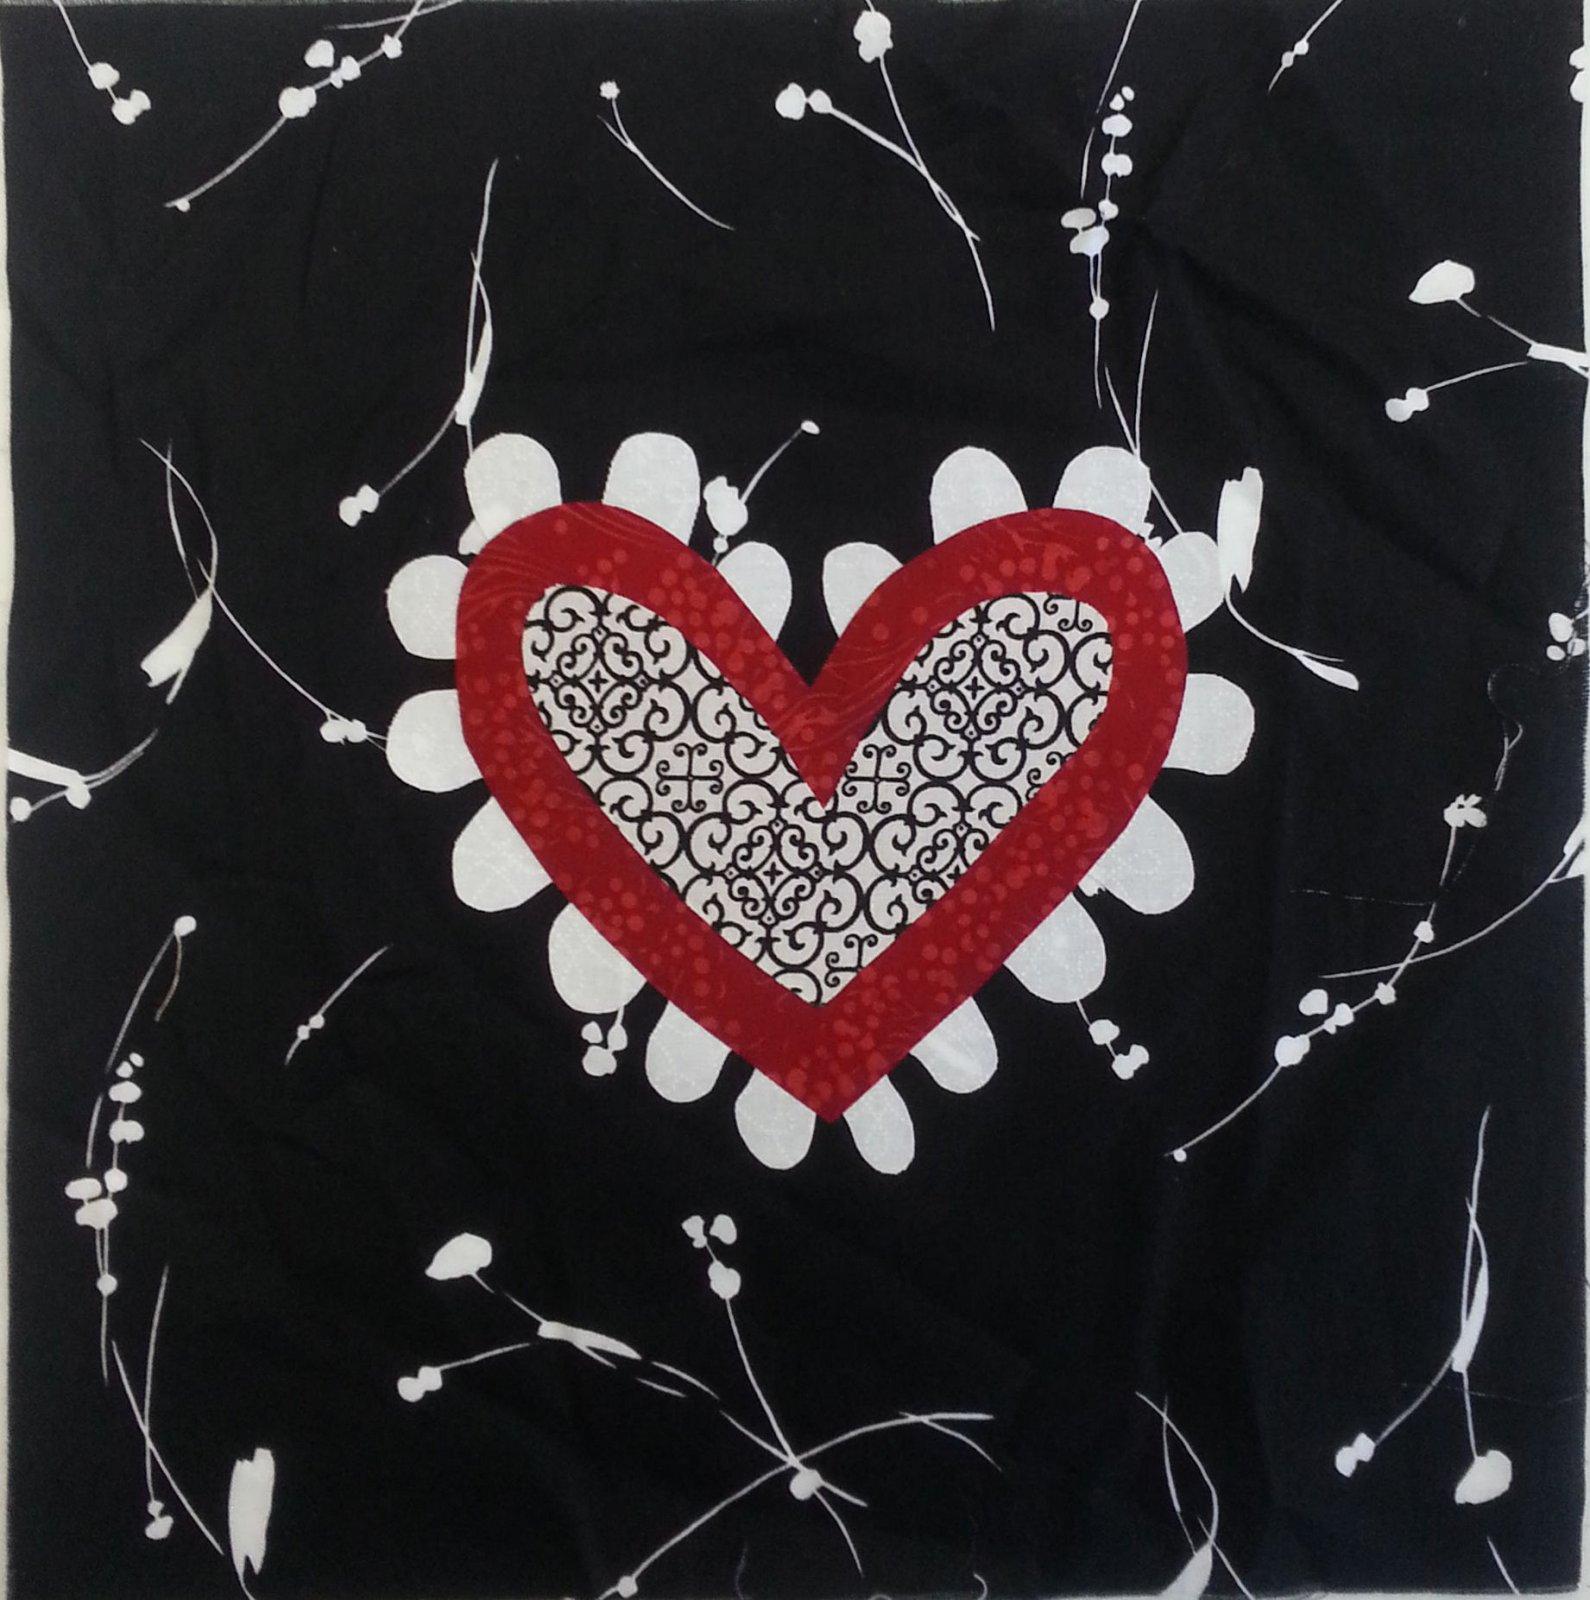 The Heart  Sample - 11x11